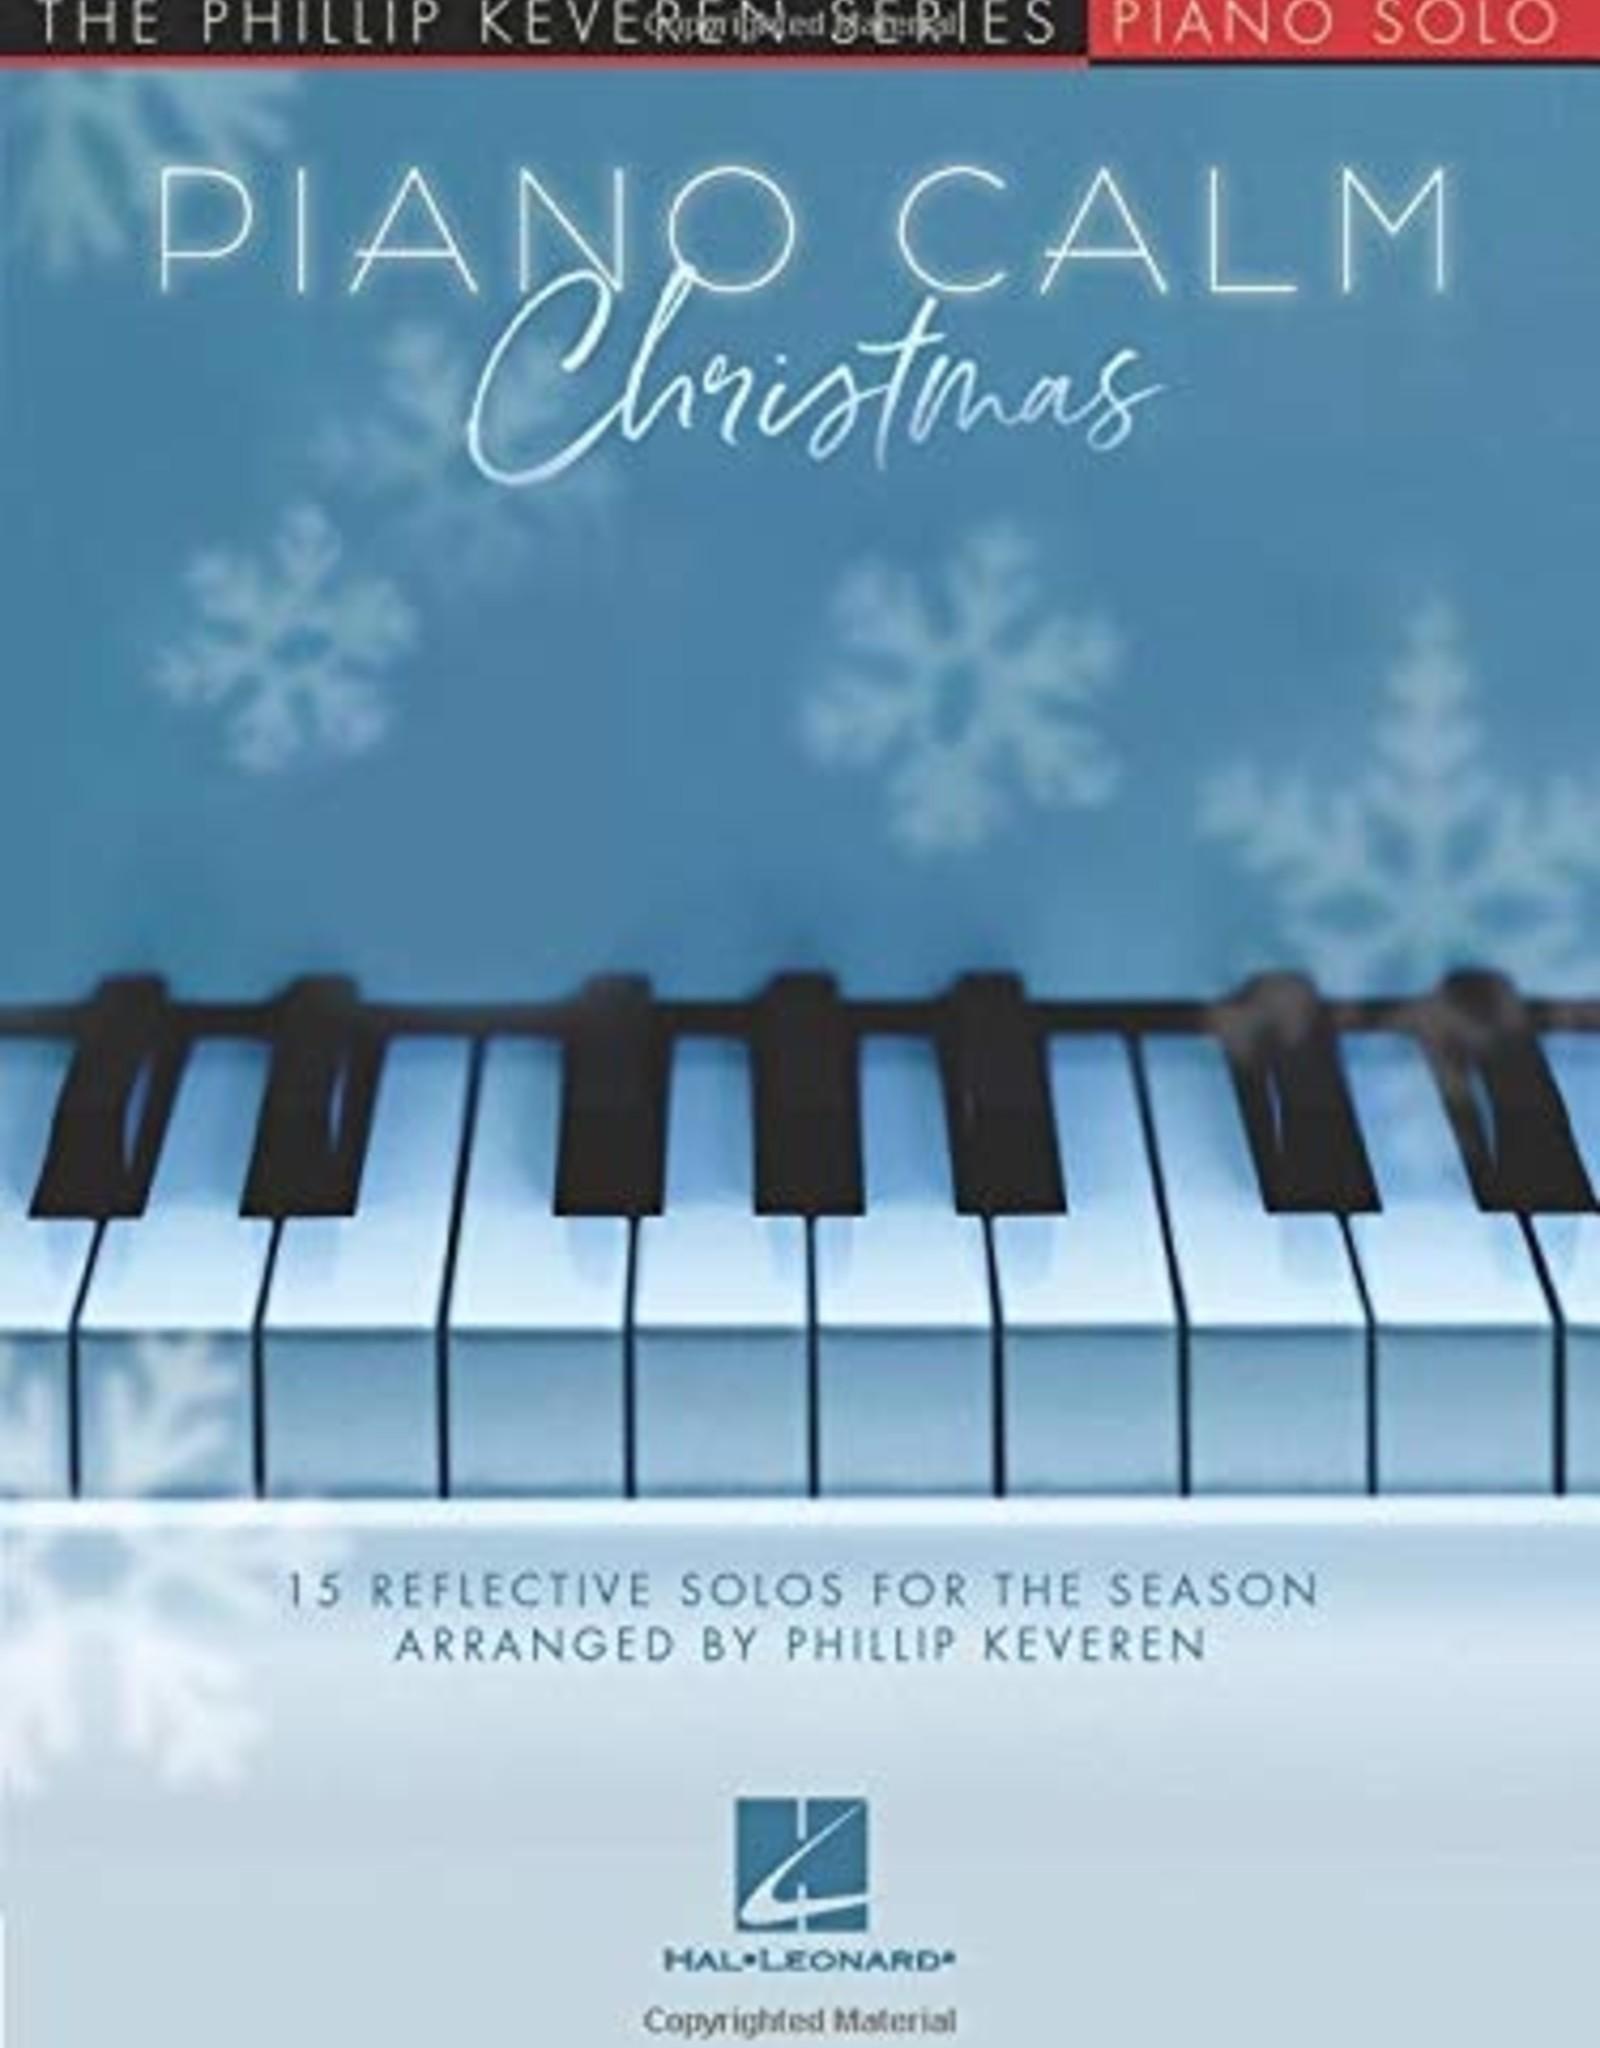 Piano Calm Christmas - The Phillip Keveren Series